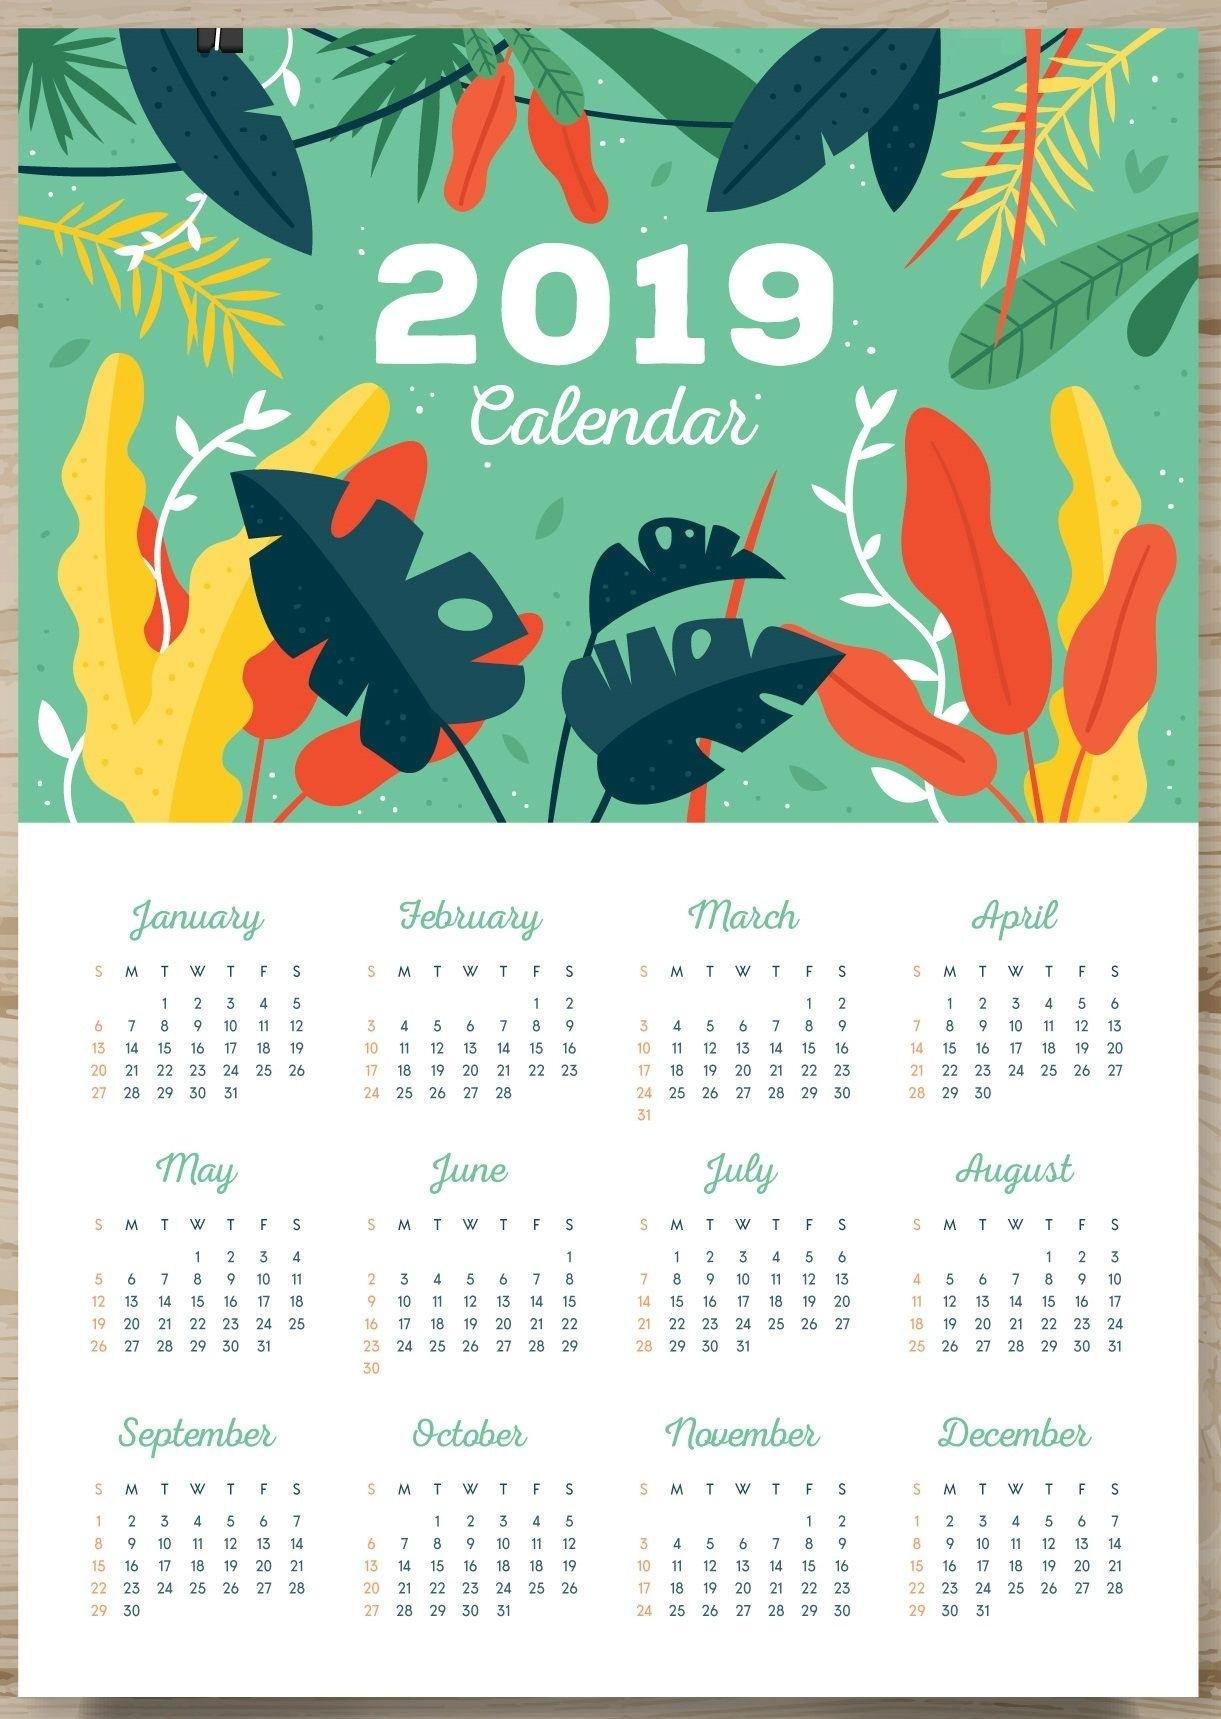 One Page Calendar 2019 | Monthly Calendar Templates | Pinterest  Monthly Calendar On One Page